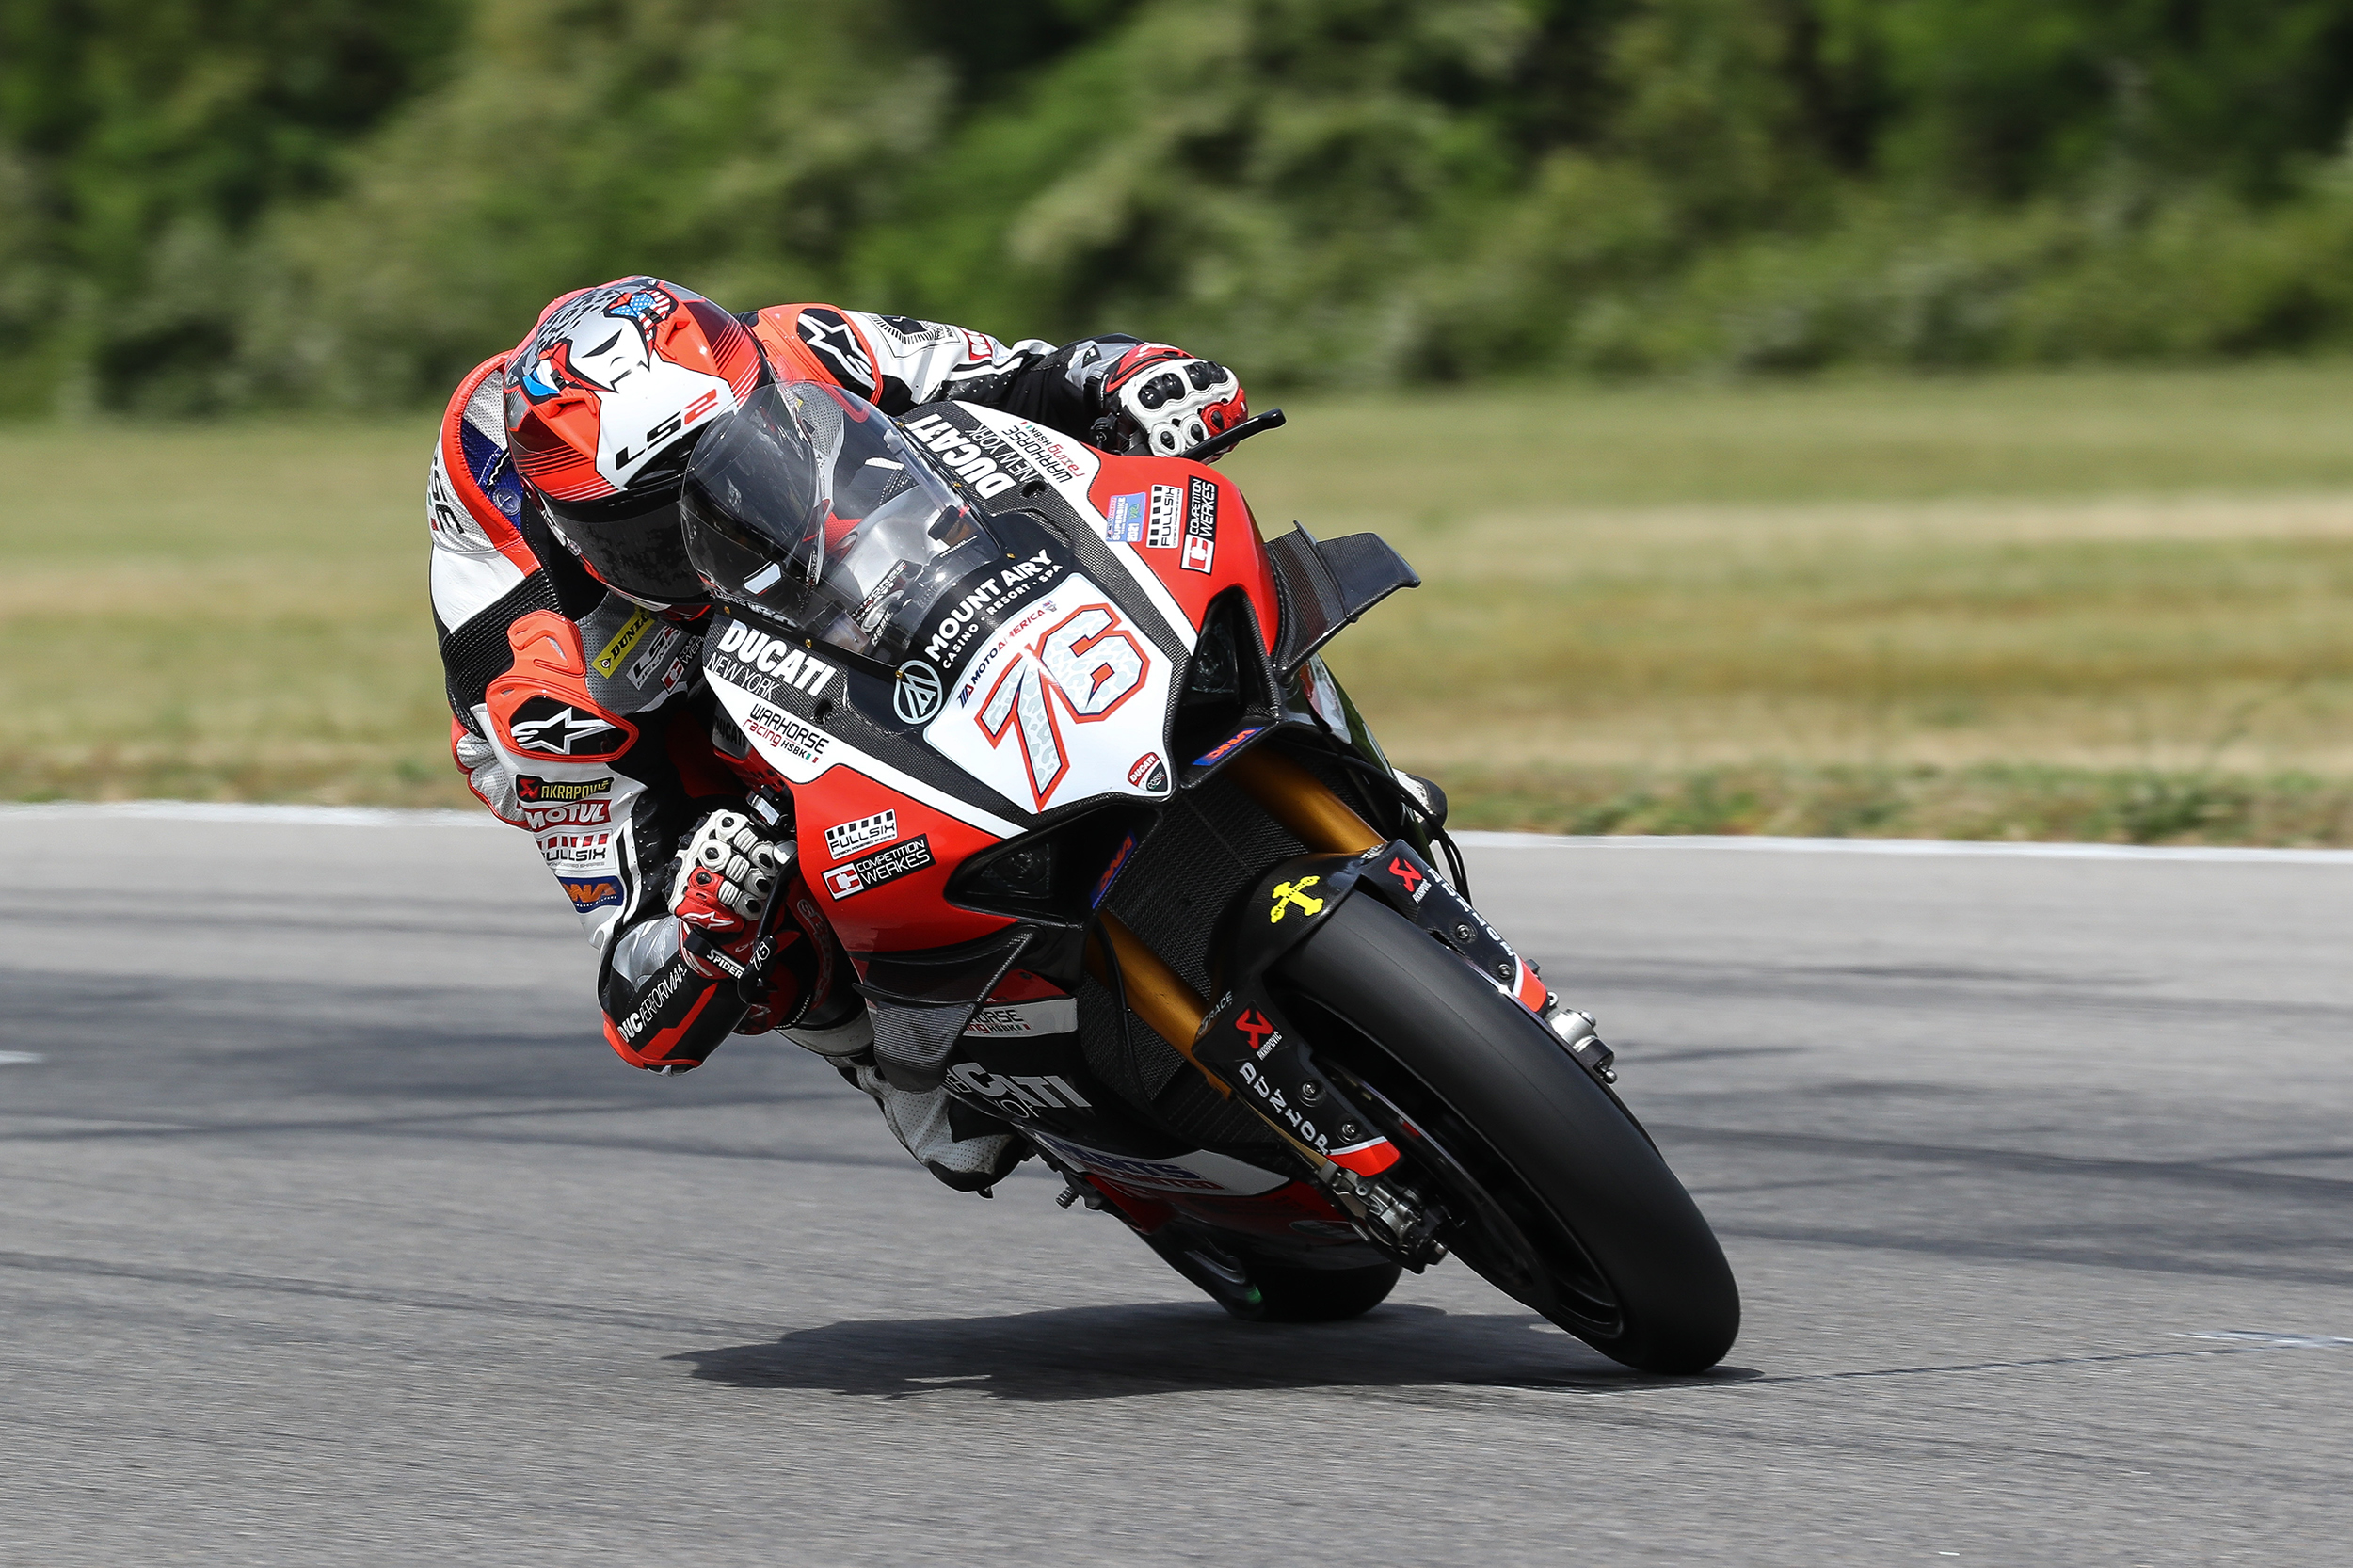 MotoAmerica - Superbike - Loris Baz #76 (2)